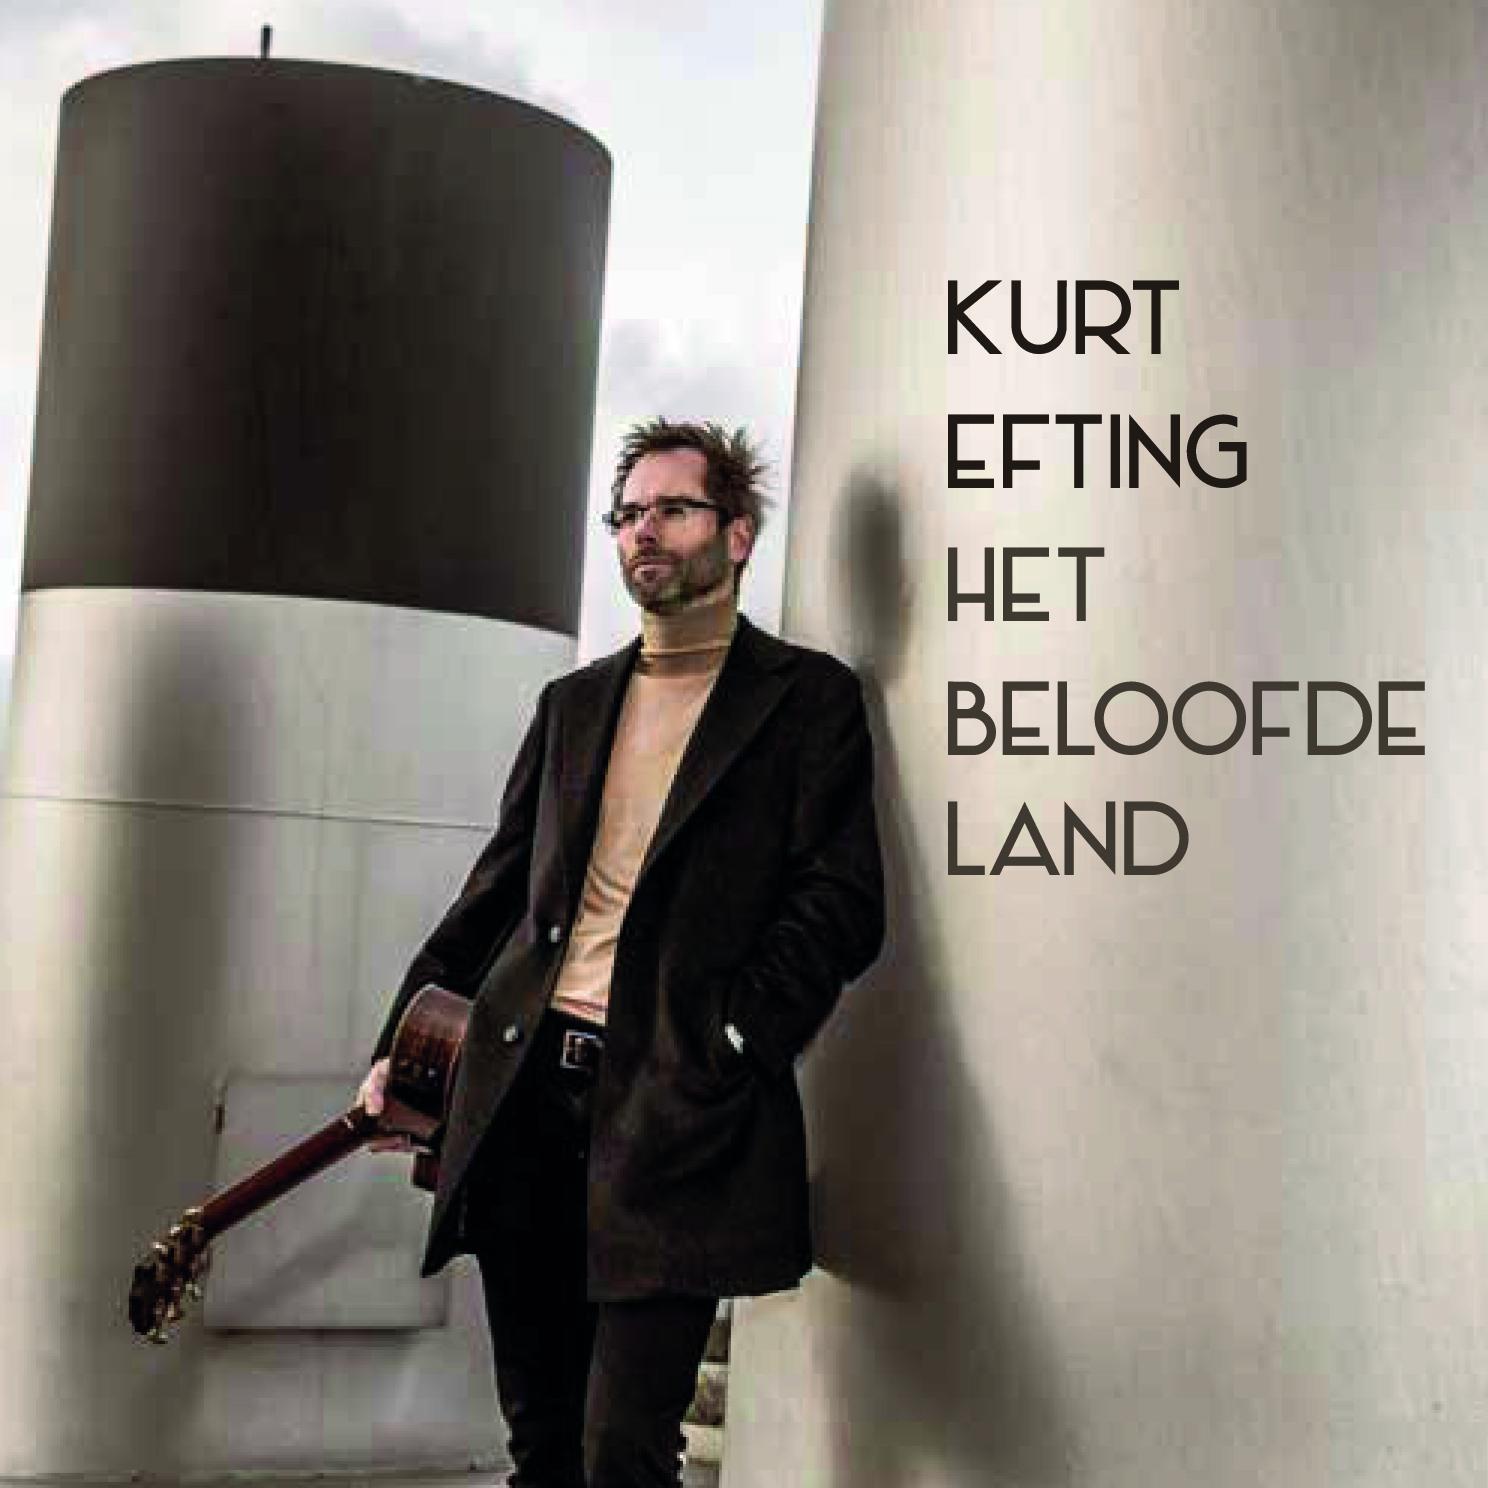 Beloofde Land Kurt Efting